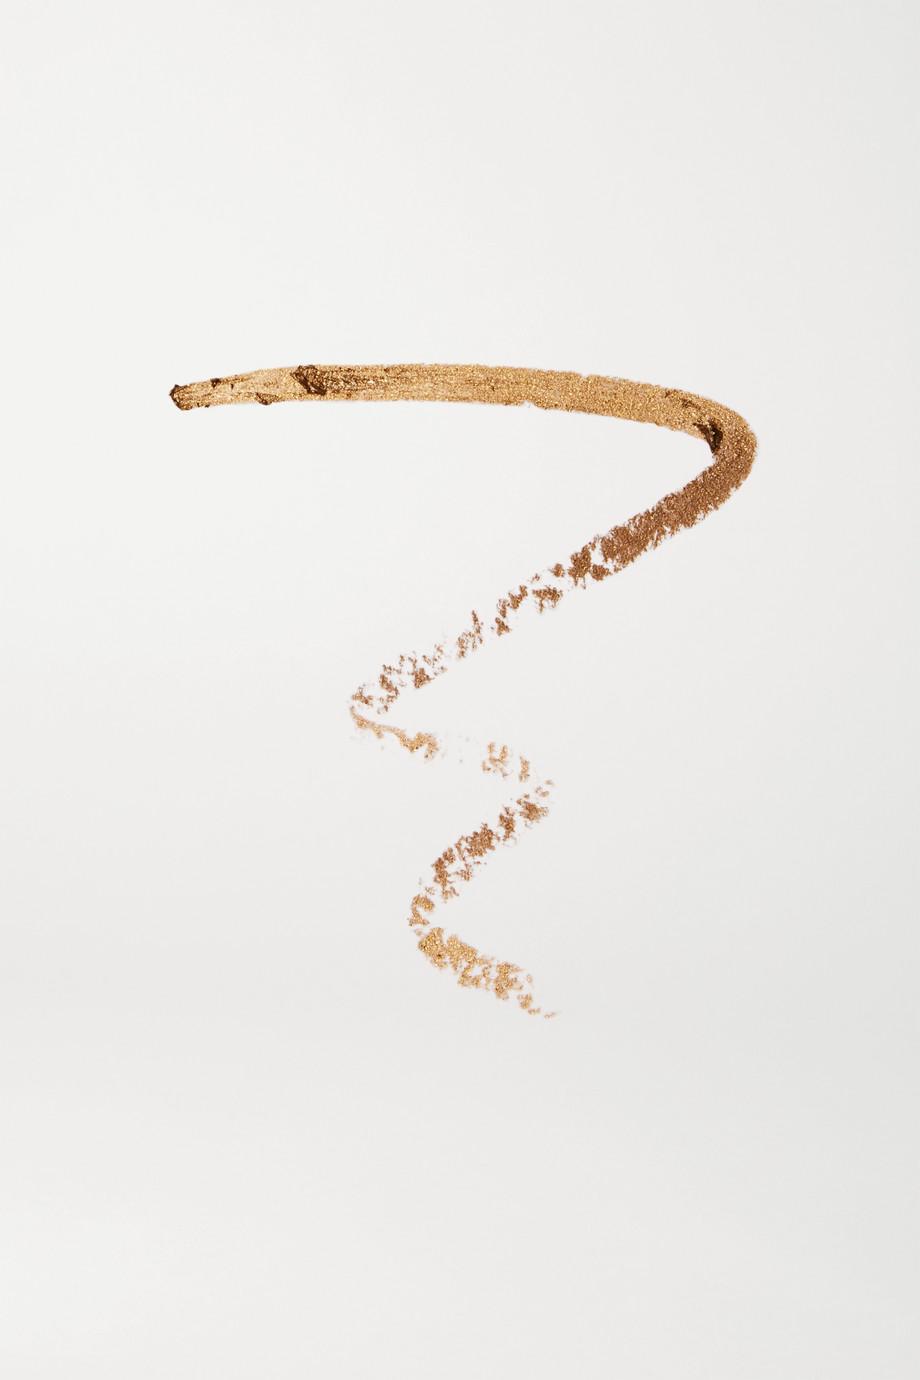 Marc Jacobs Beauty Highliner Gel Eye Crayon - Top Brass